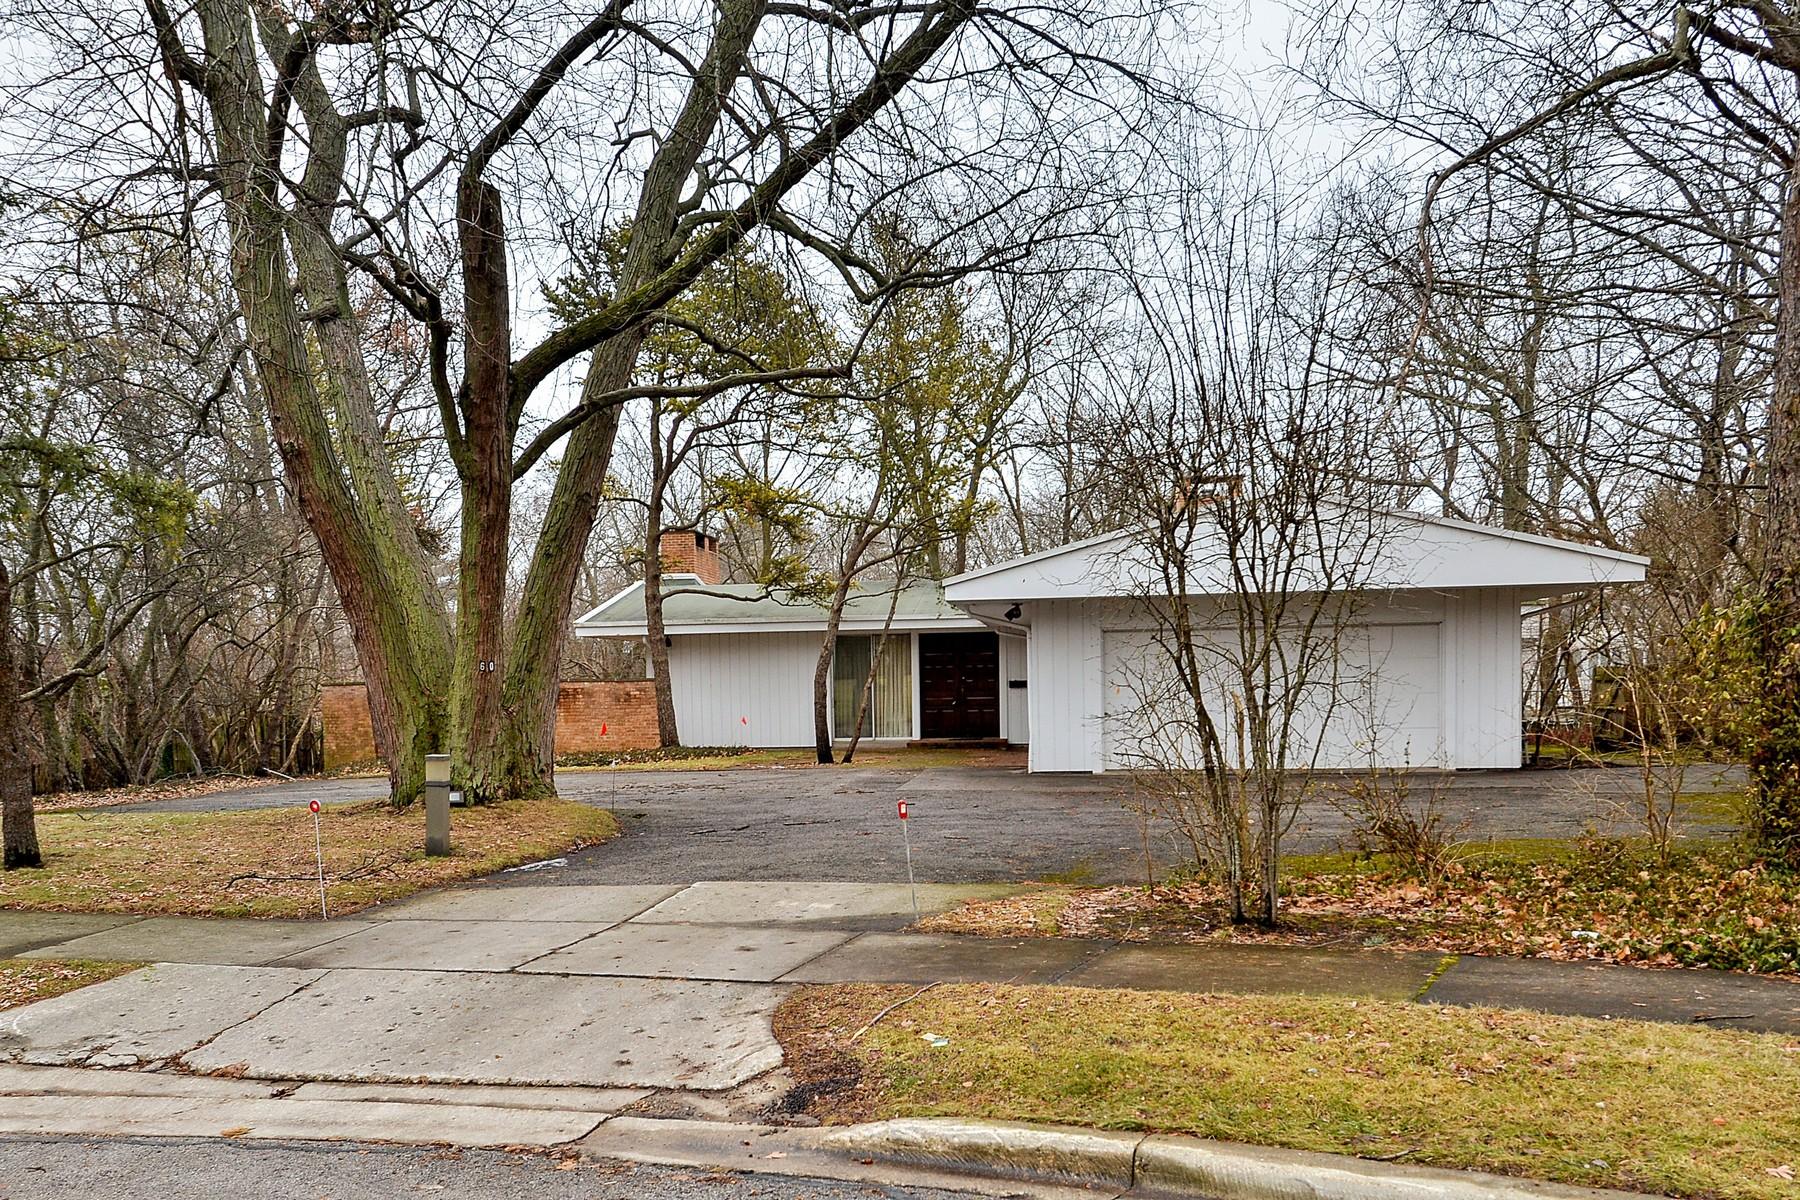 独户住宅 为 销售 在 Spectacular Location for a Redevelopment Project 60 Brentwood Drive, 格兰克, 伊利诺斯州, 60022 美国